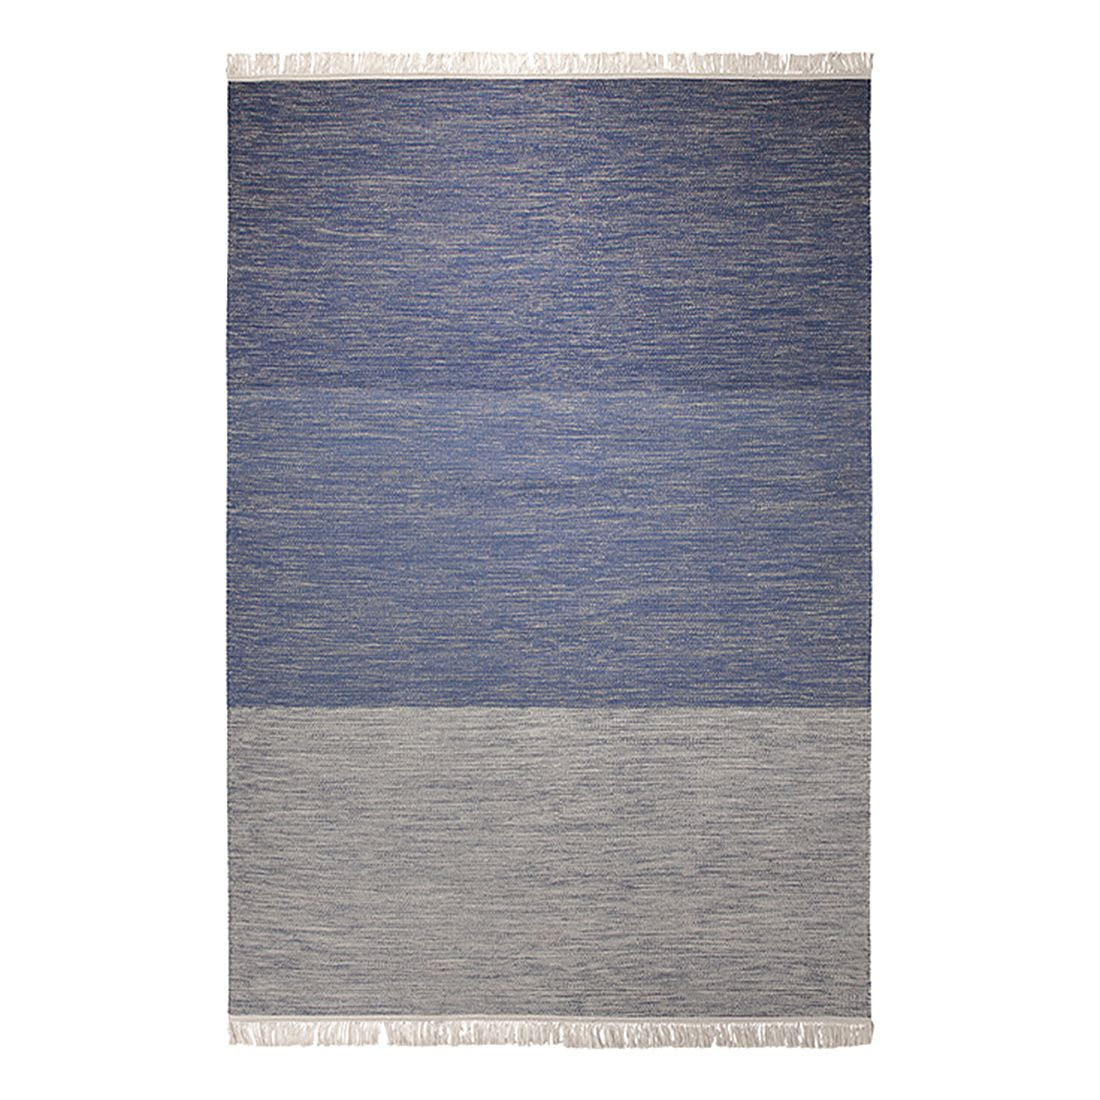 Teppich Casual – Blau – Maße: 130 x 190 cm, Esprit Home bestellen